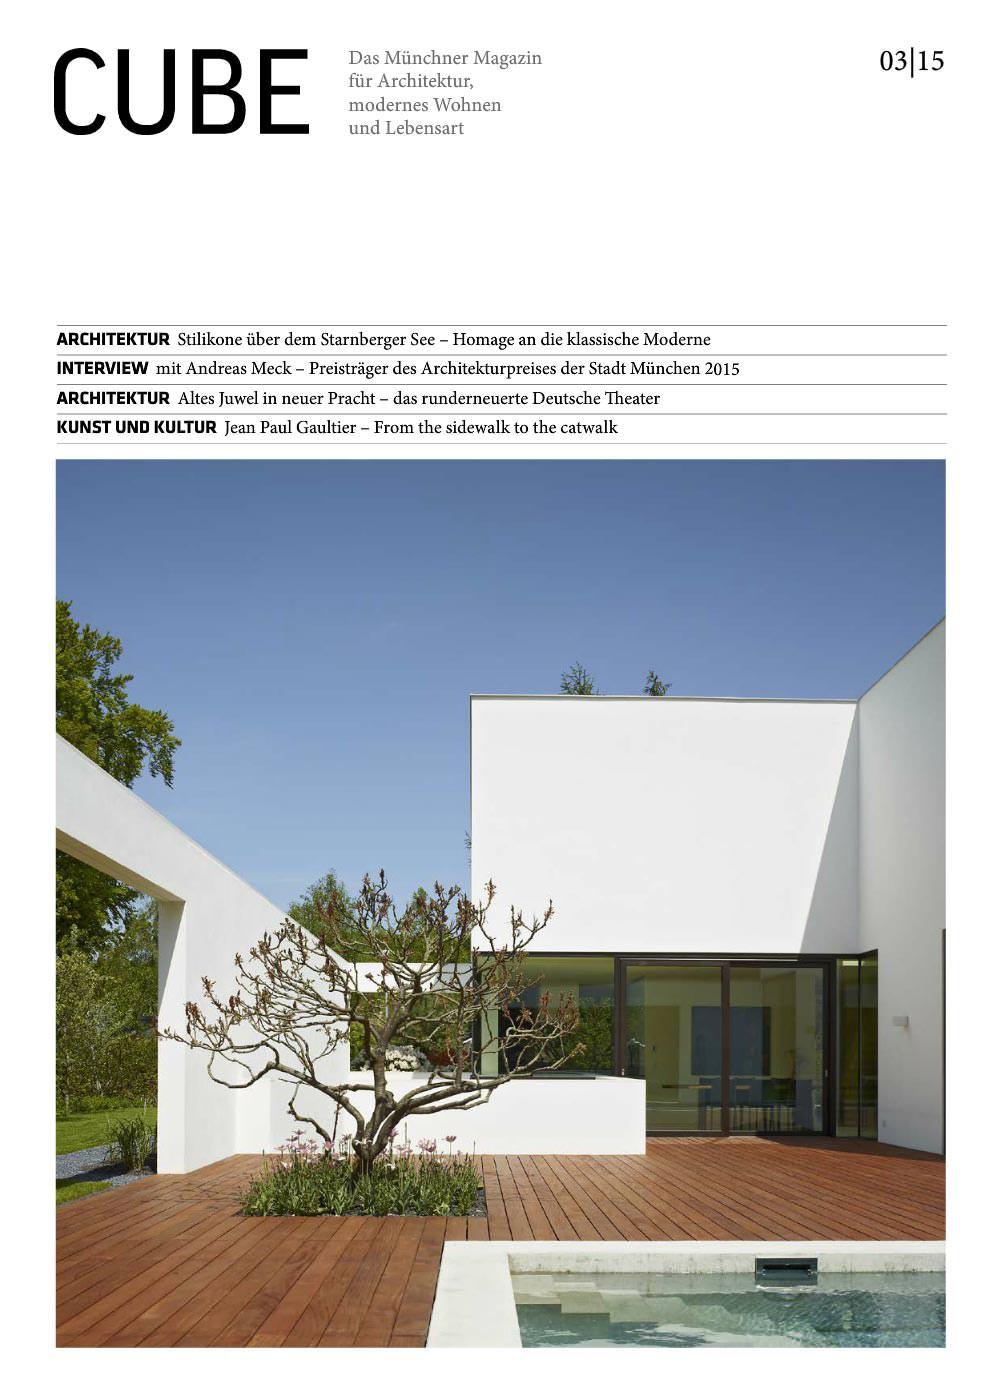 CUBE Magazine - Hauck & Aufhäuser   CBA Clemens Bachmann Architects ...